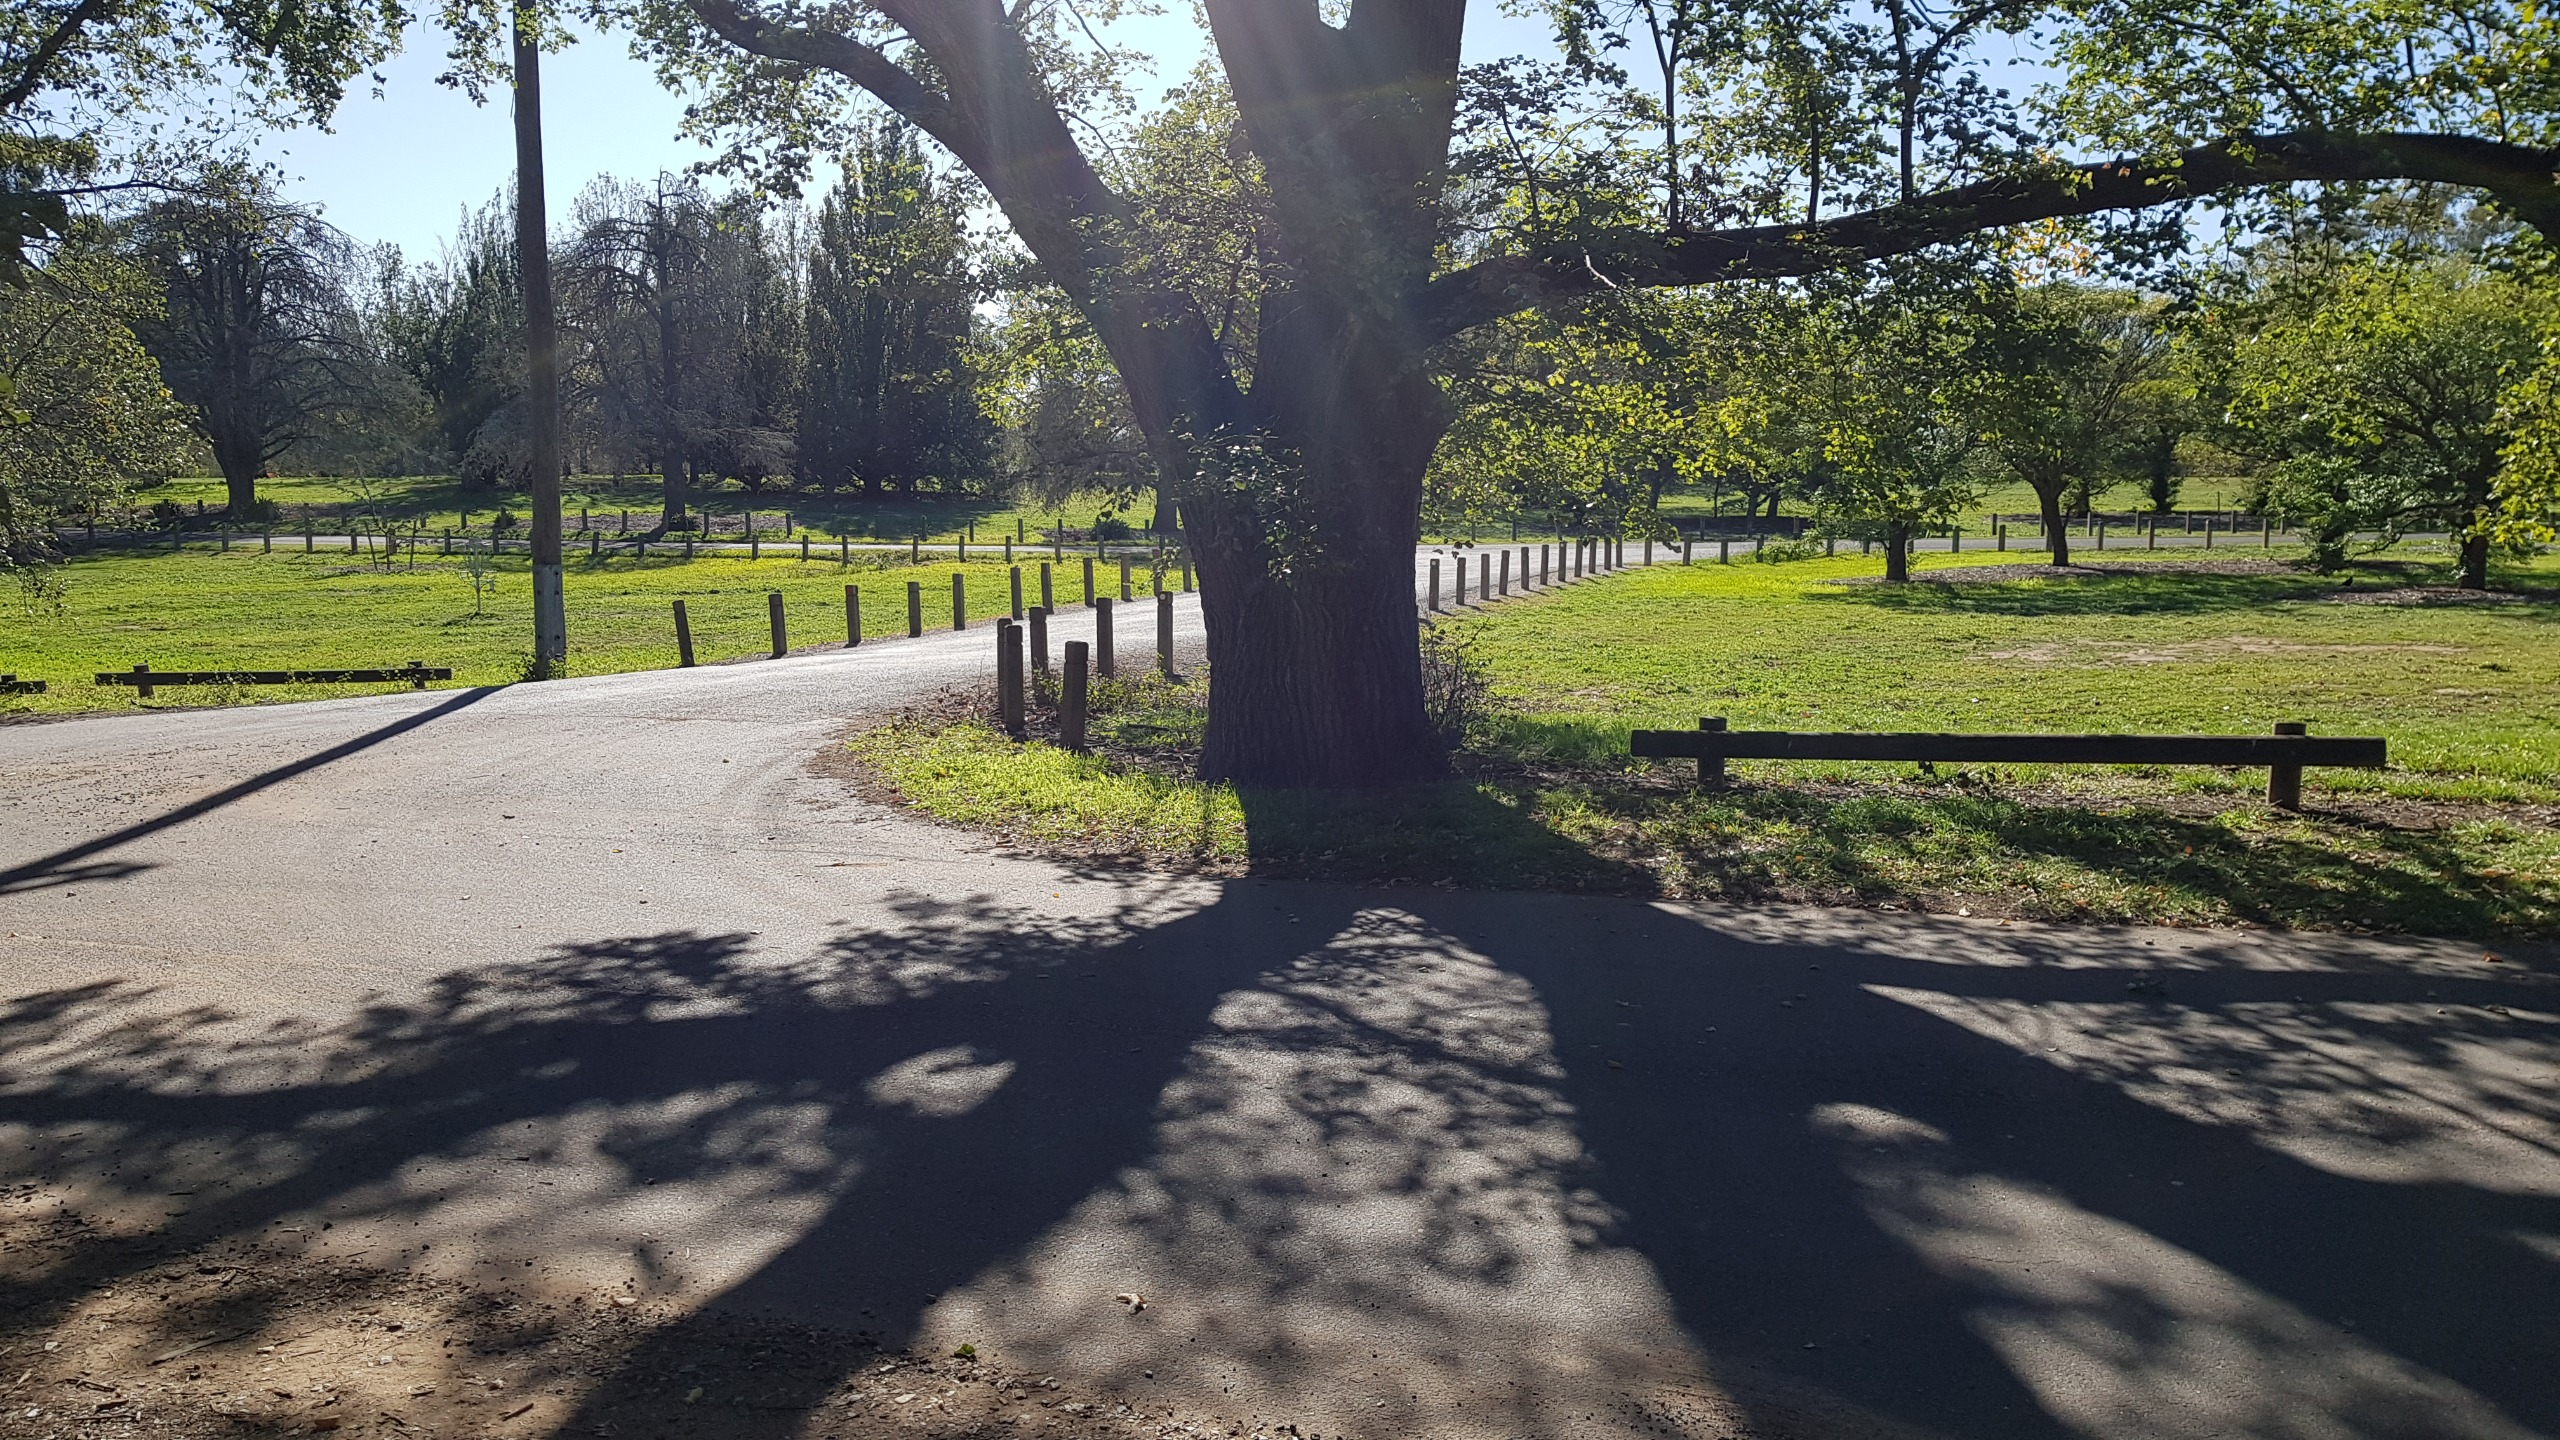 Road 3 - Laneway to Yarralumla Nursery looking towards Weston Park Road